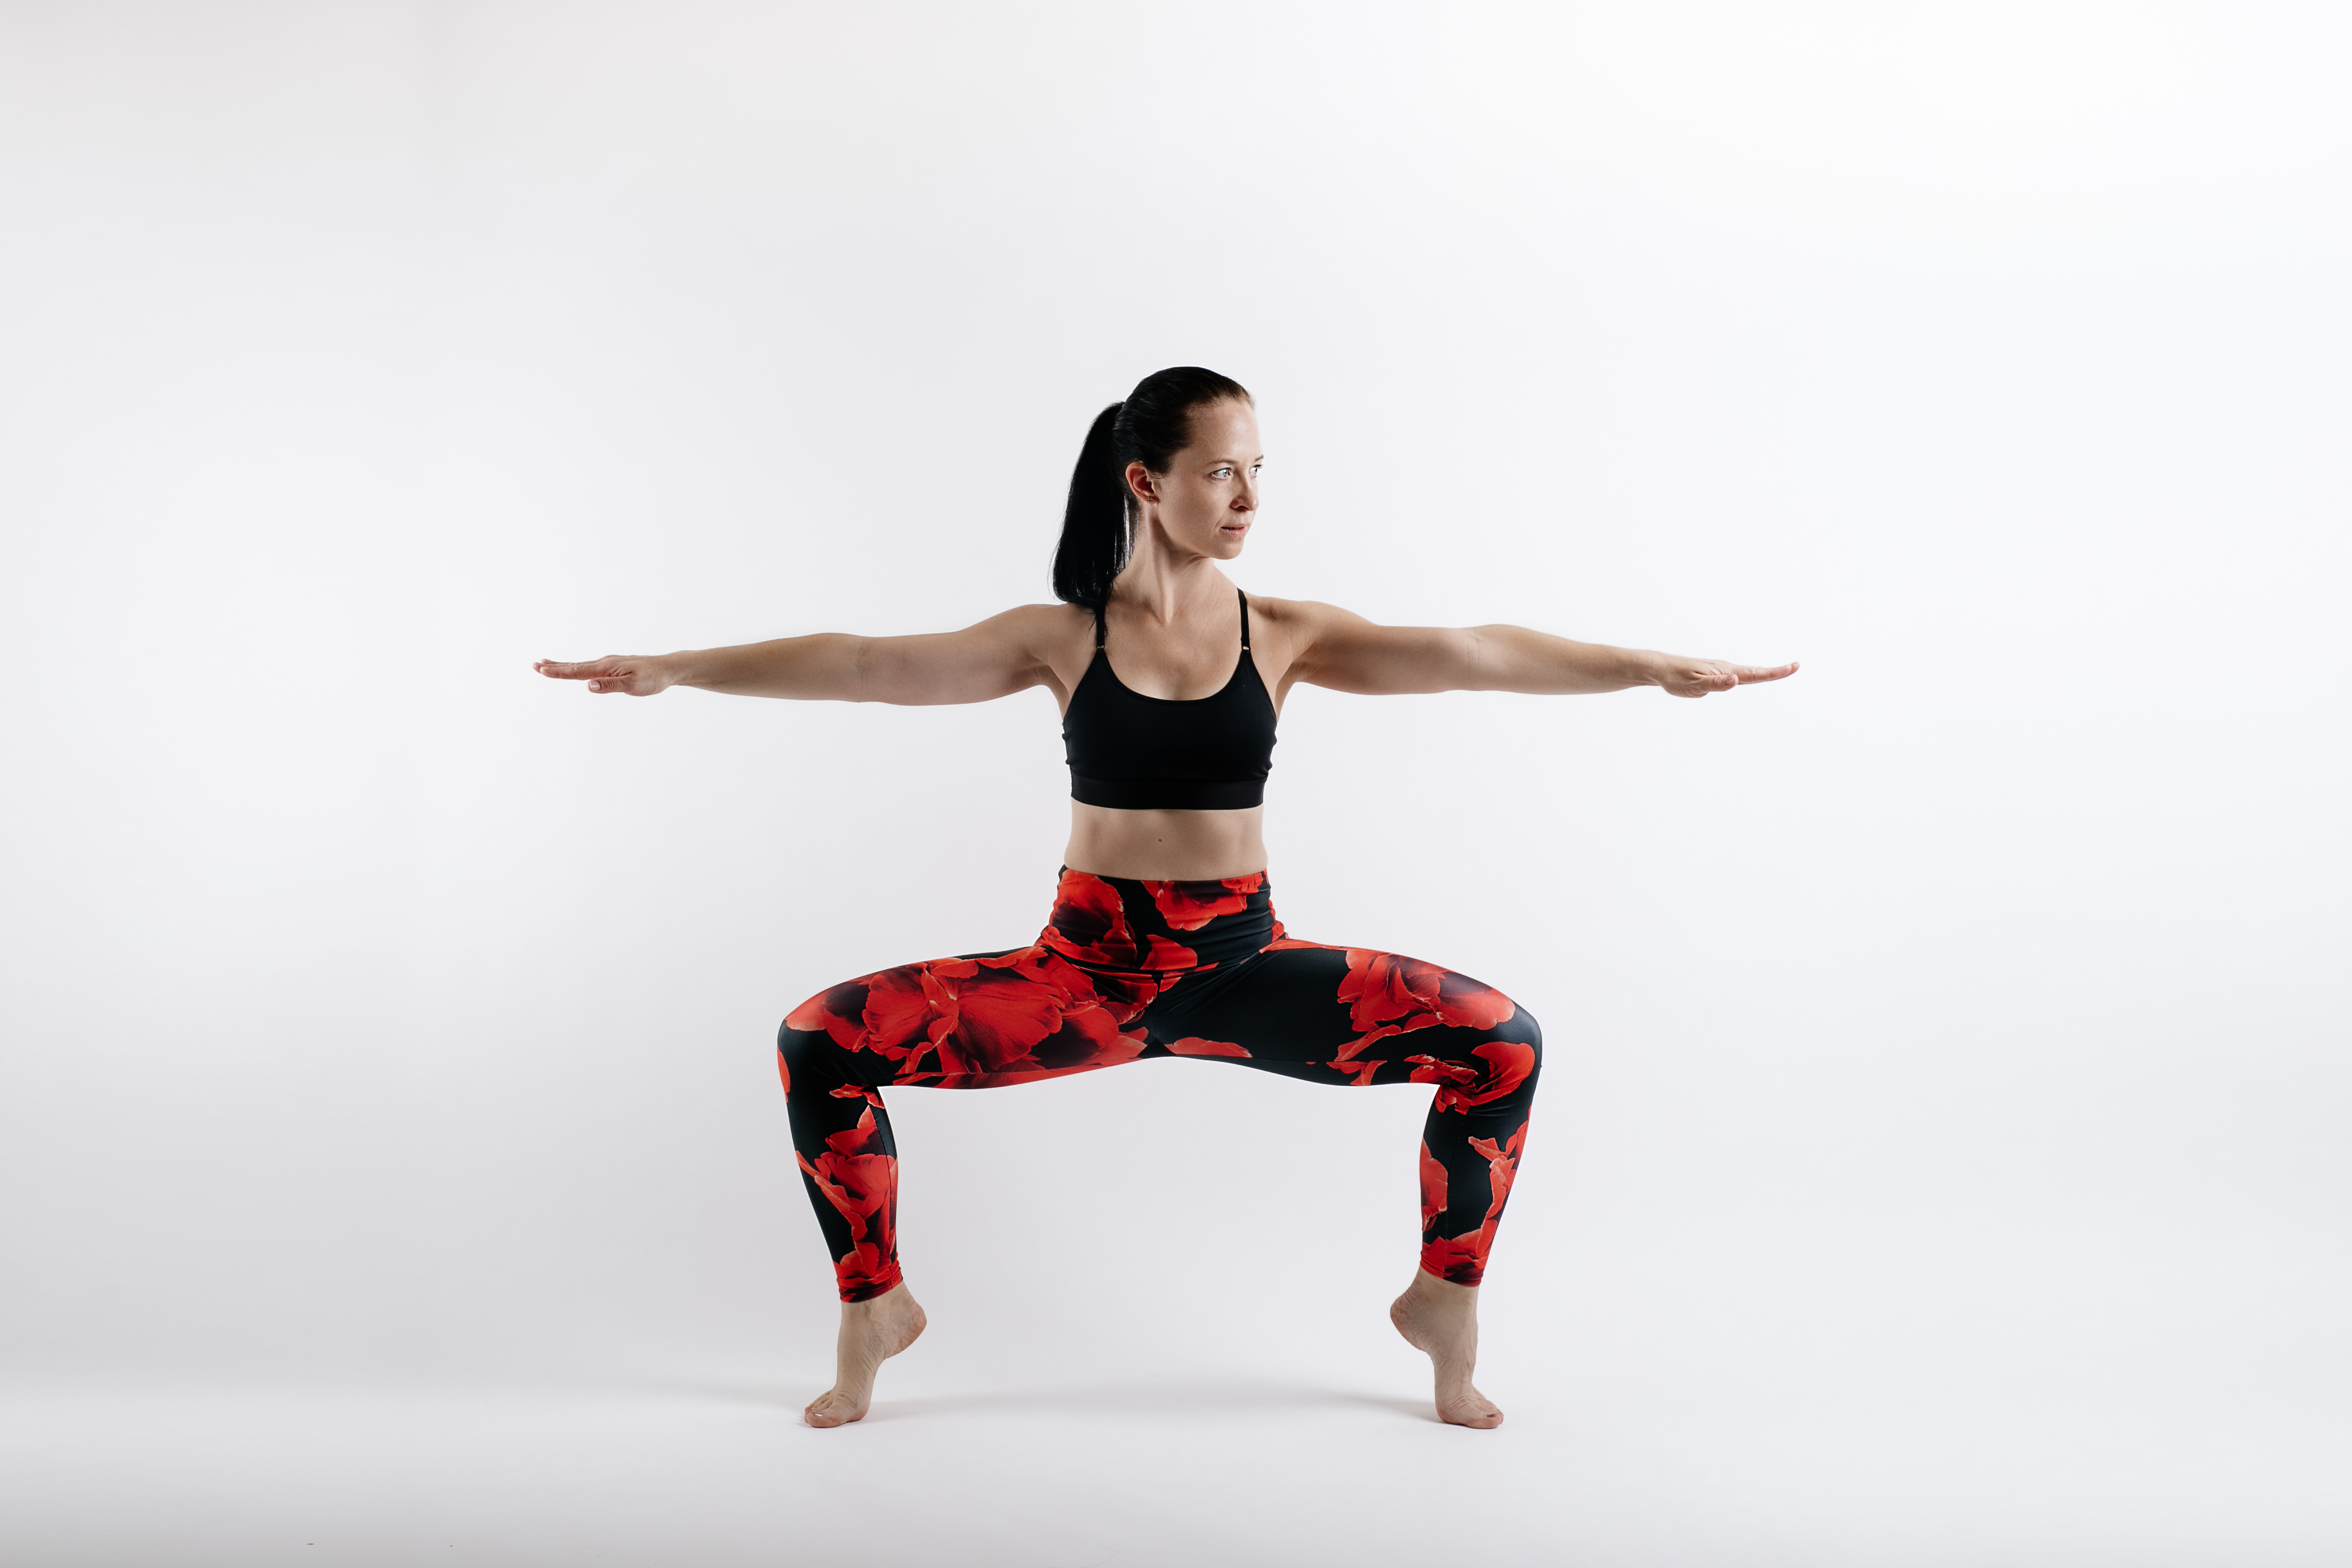 10 wöchiges Pilates & Slings Myofasziales Training® Programm, dass deine Muskeln